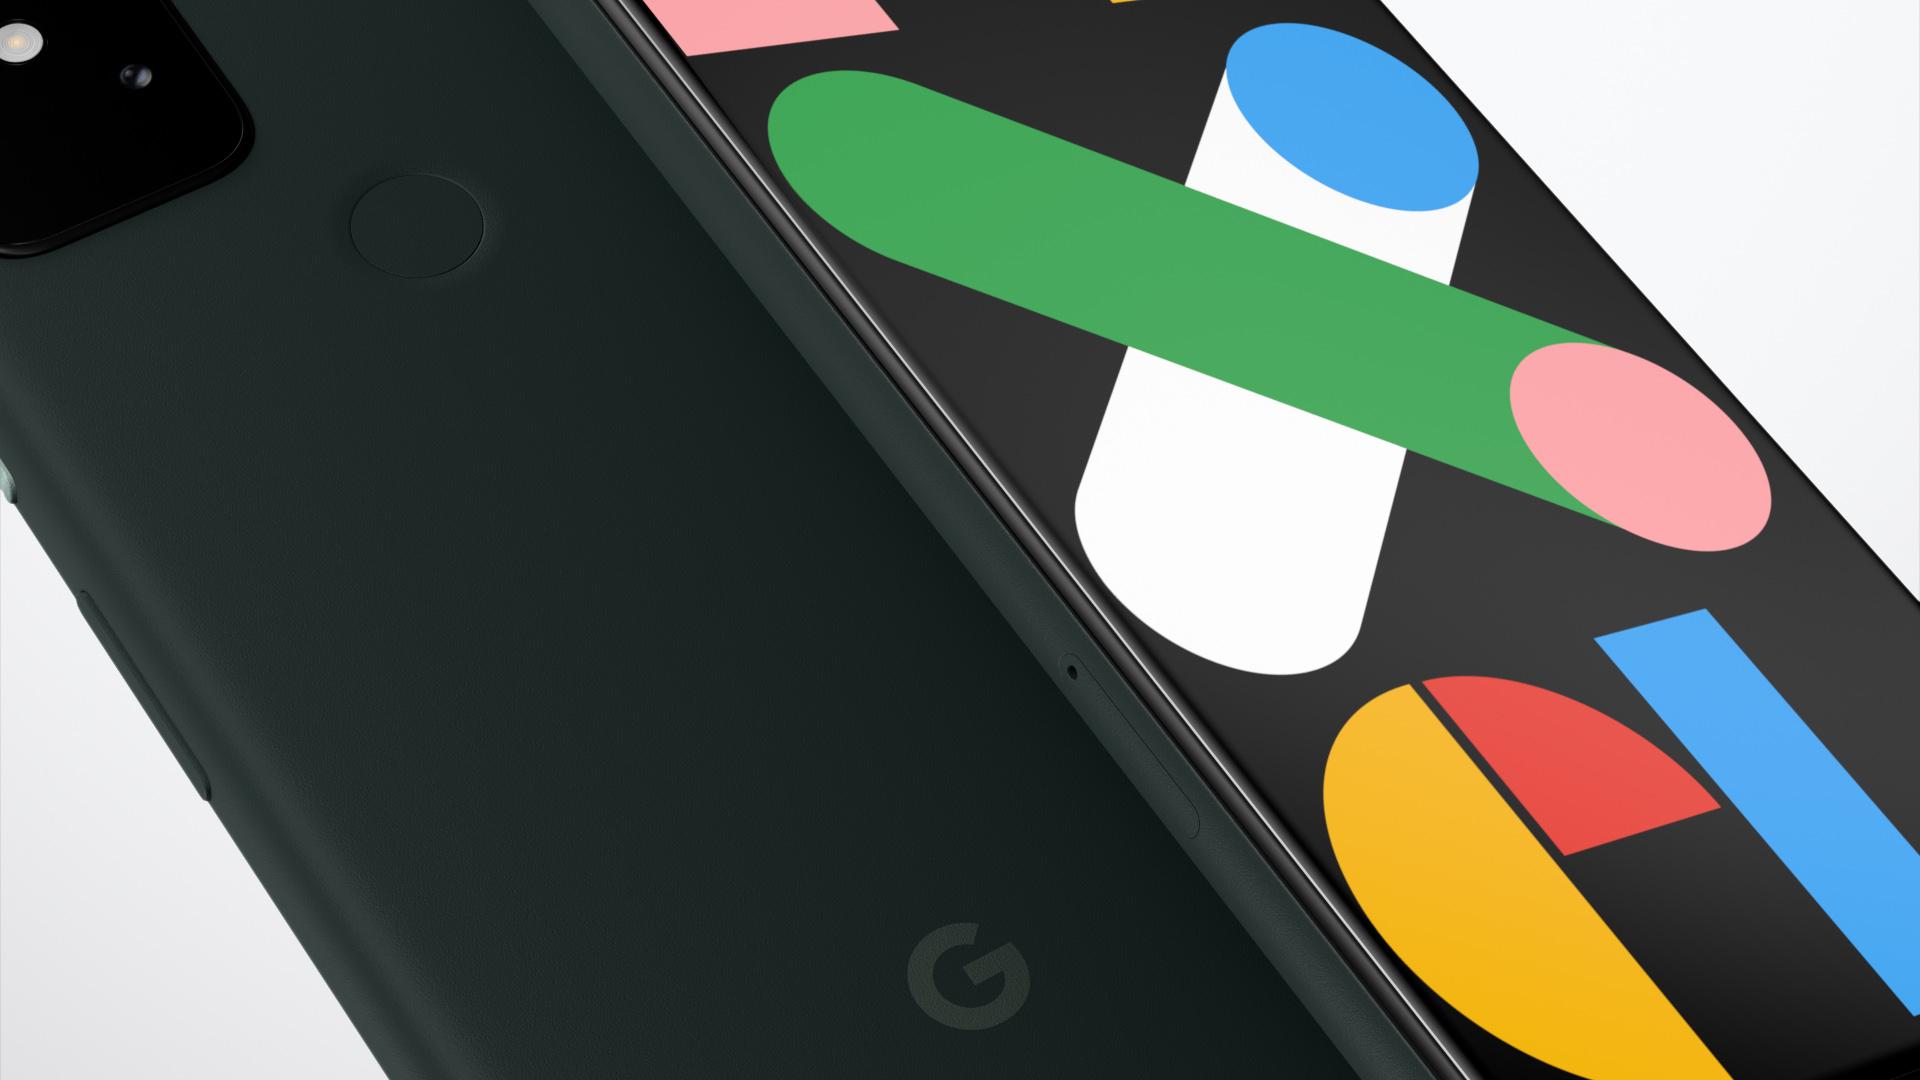 5G Pixel Phones Value 15 OLV US EN 169 GoogleStore 00345